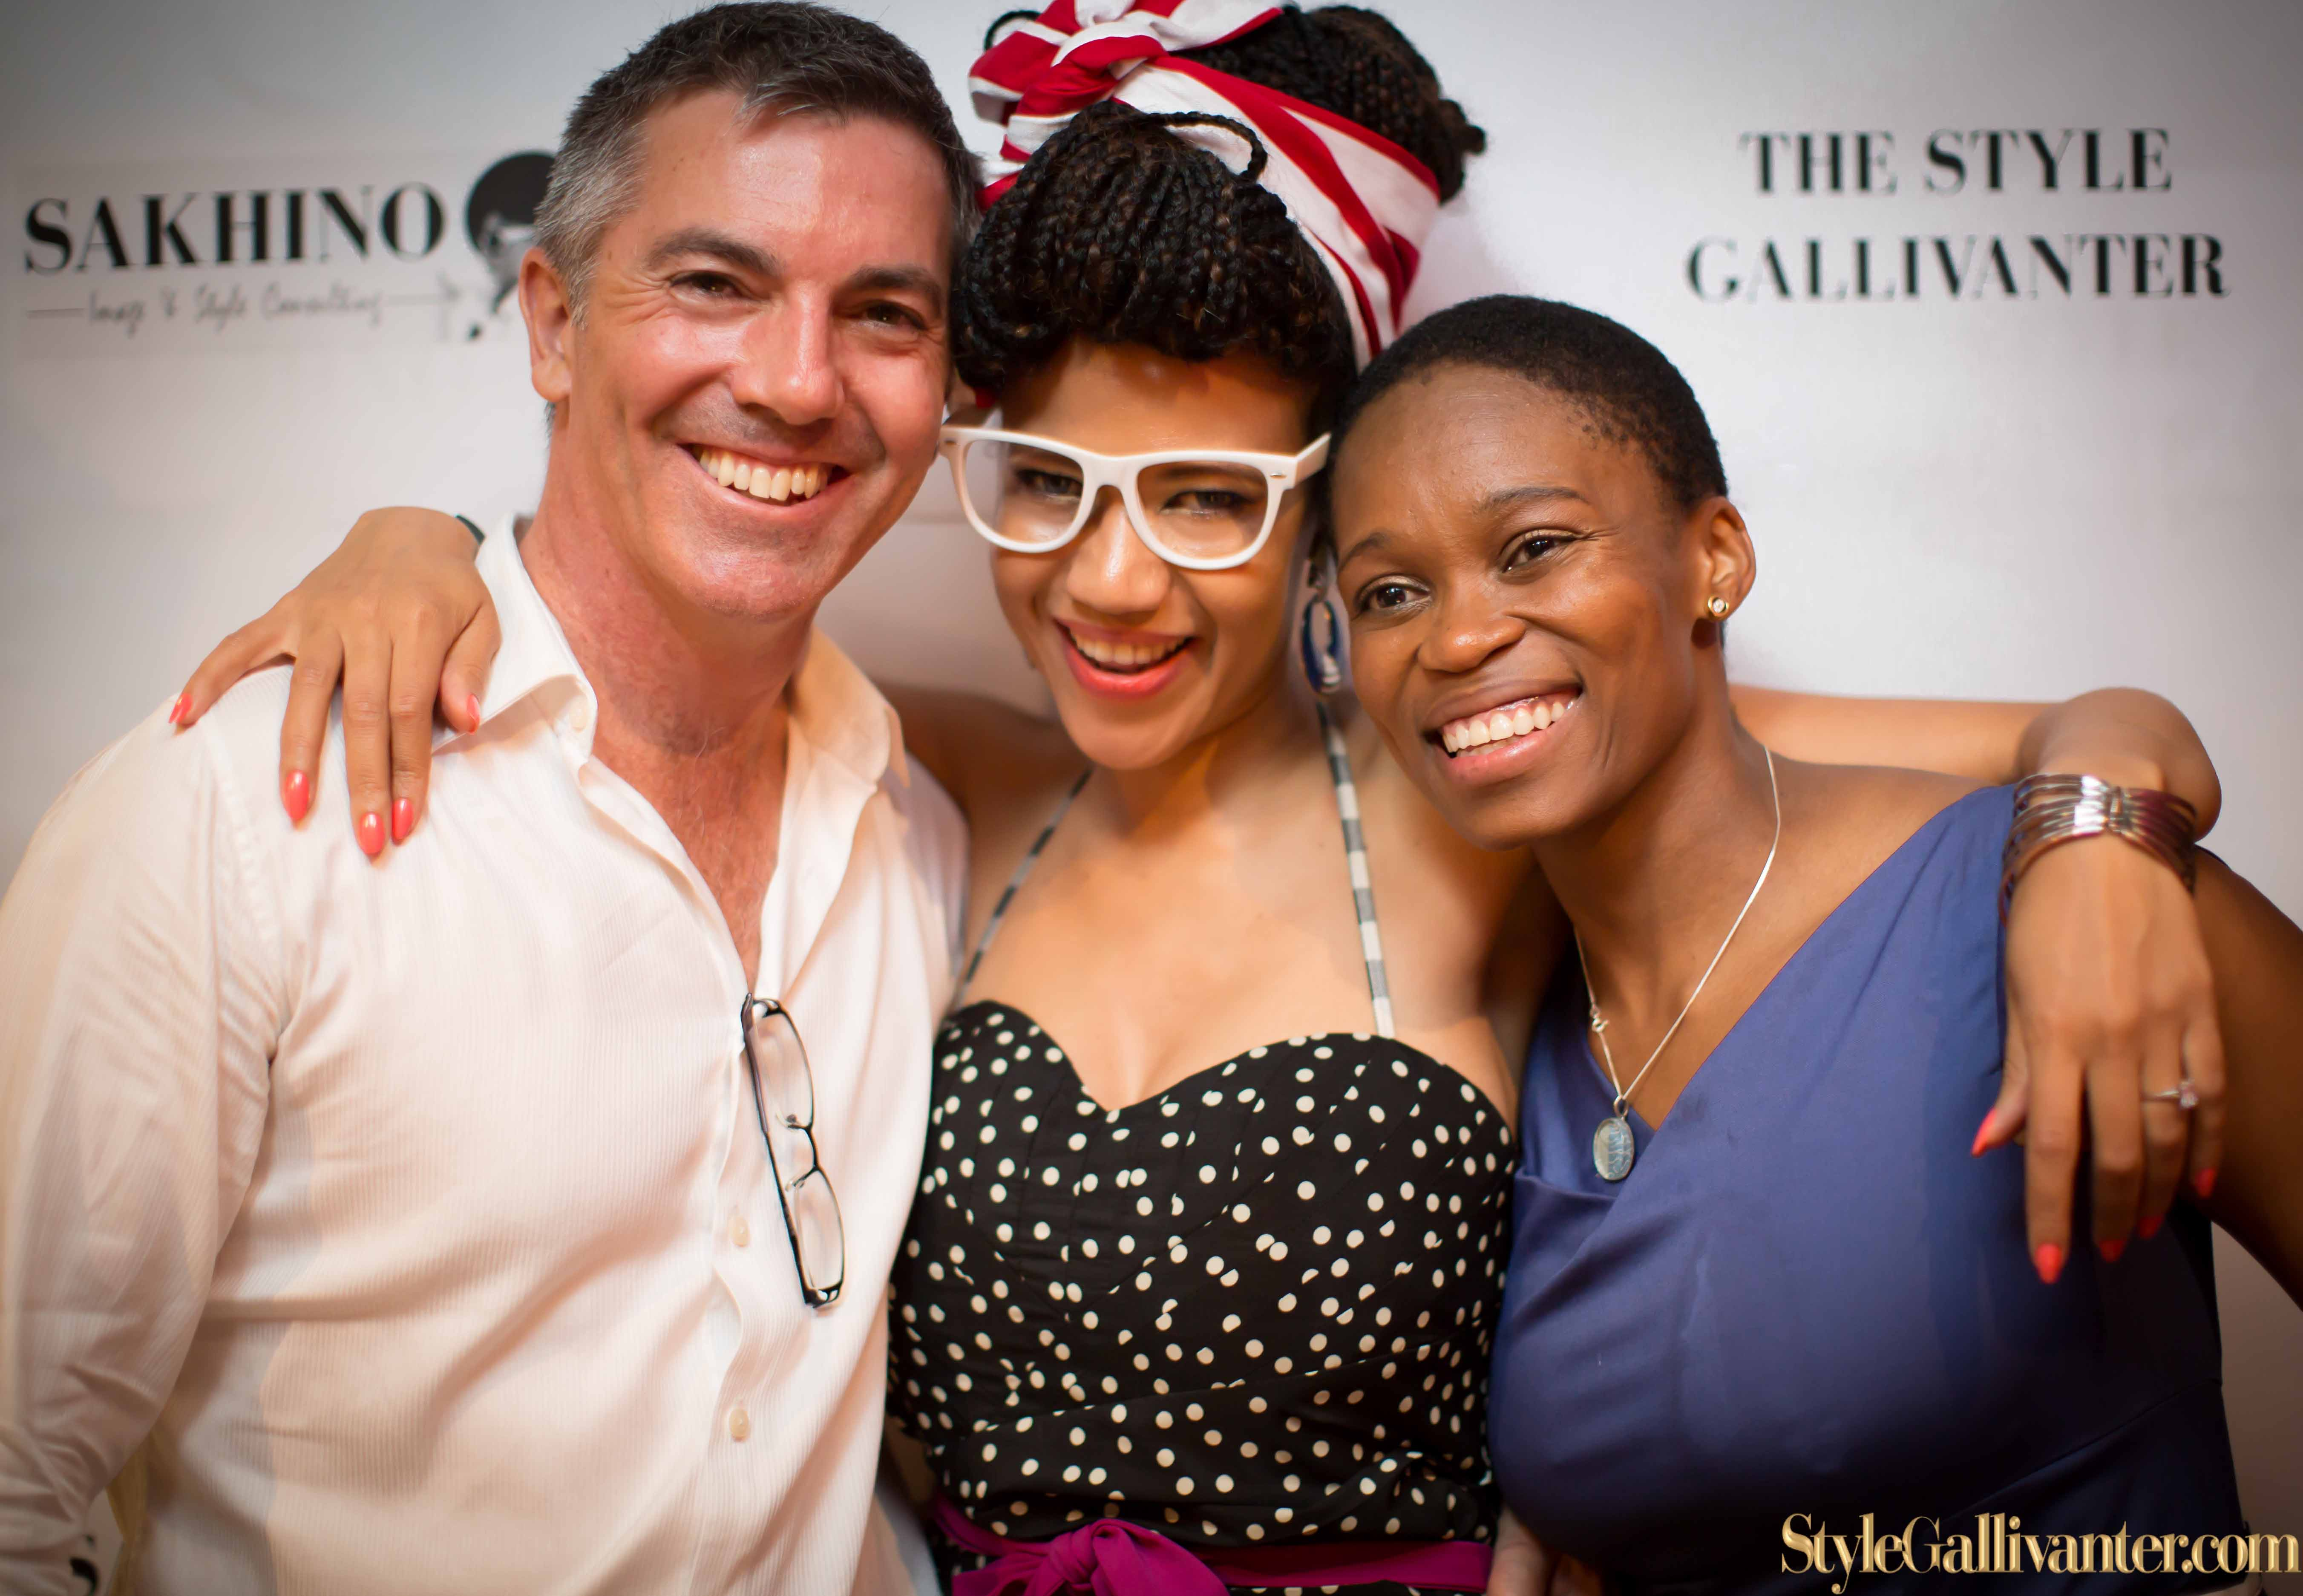 fashion-events-melbourne-2014_niche-on-bridge-restaurant_niche-function-room-richmond_best-venues-melbourne_high-fashion-venues-melbourne_melbourne's-best-fashion-bloggers-2014-11